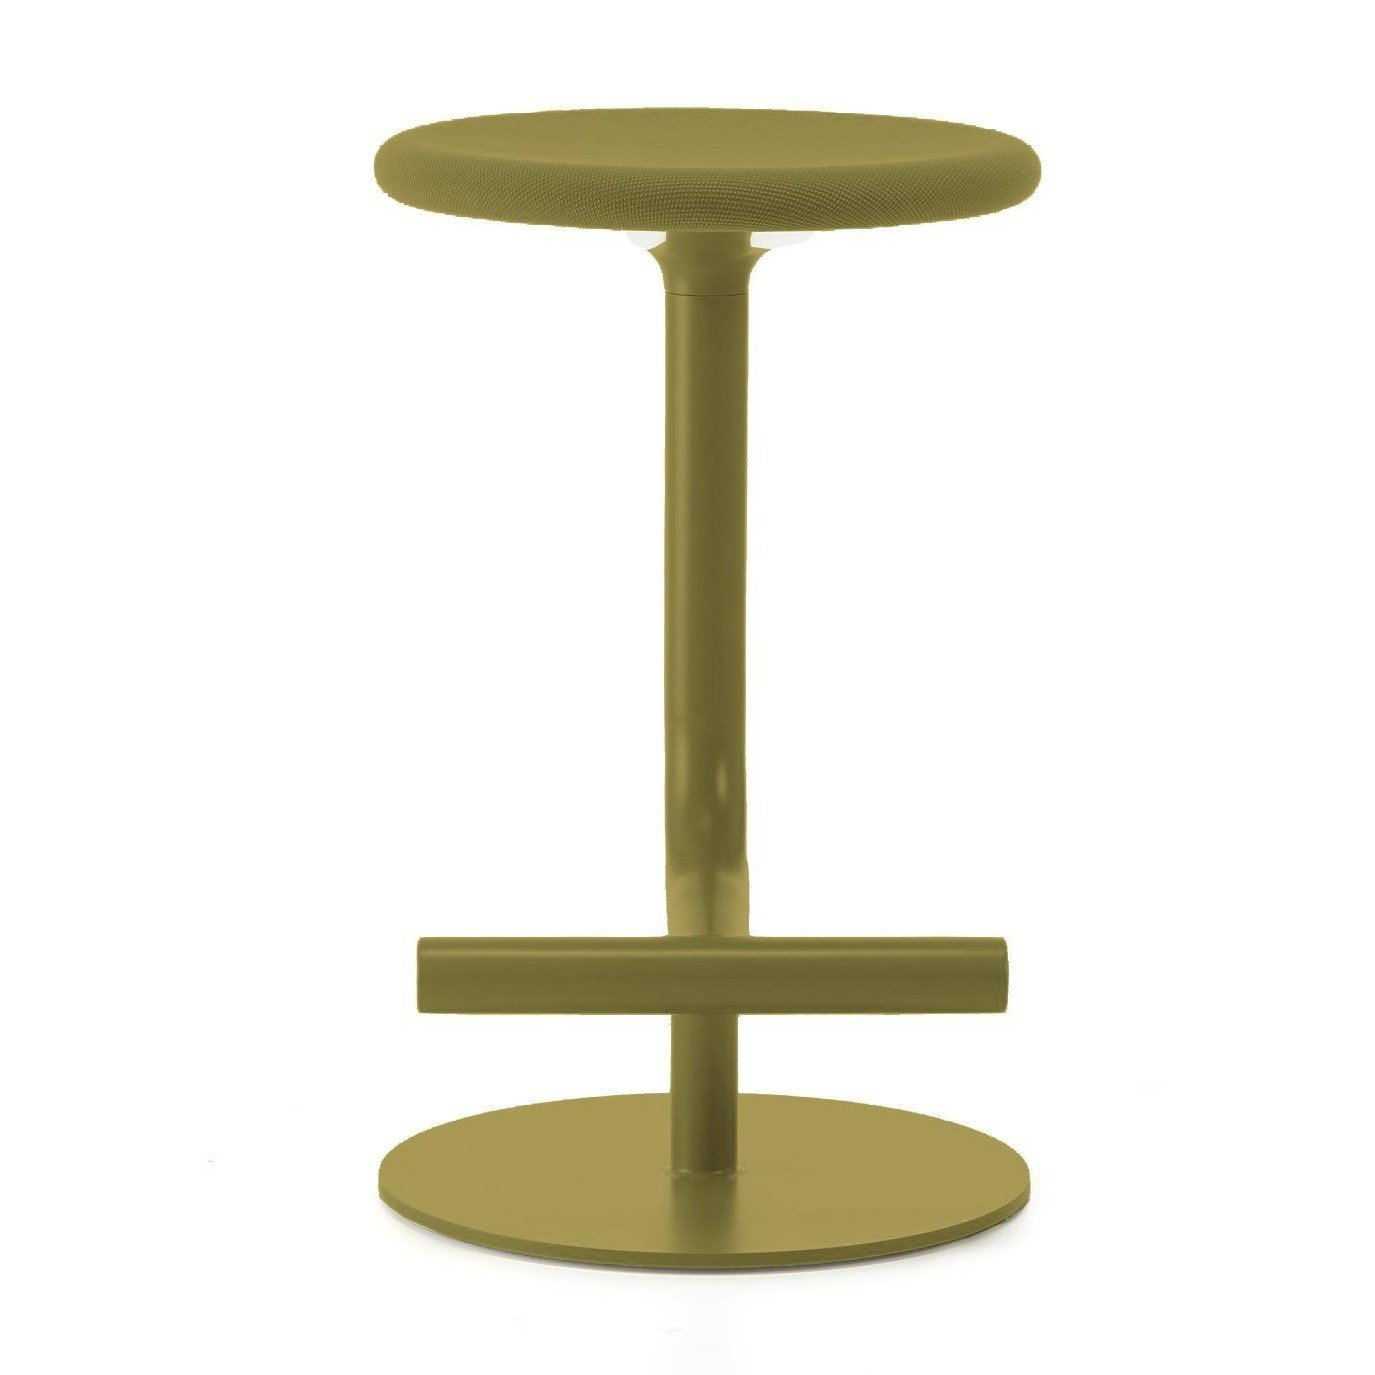 Magis Tibu Bar Stool Upholstered 60 70cm Ambientedirect